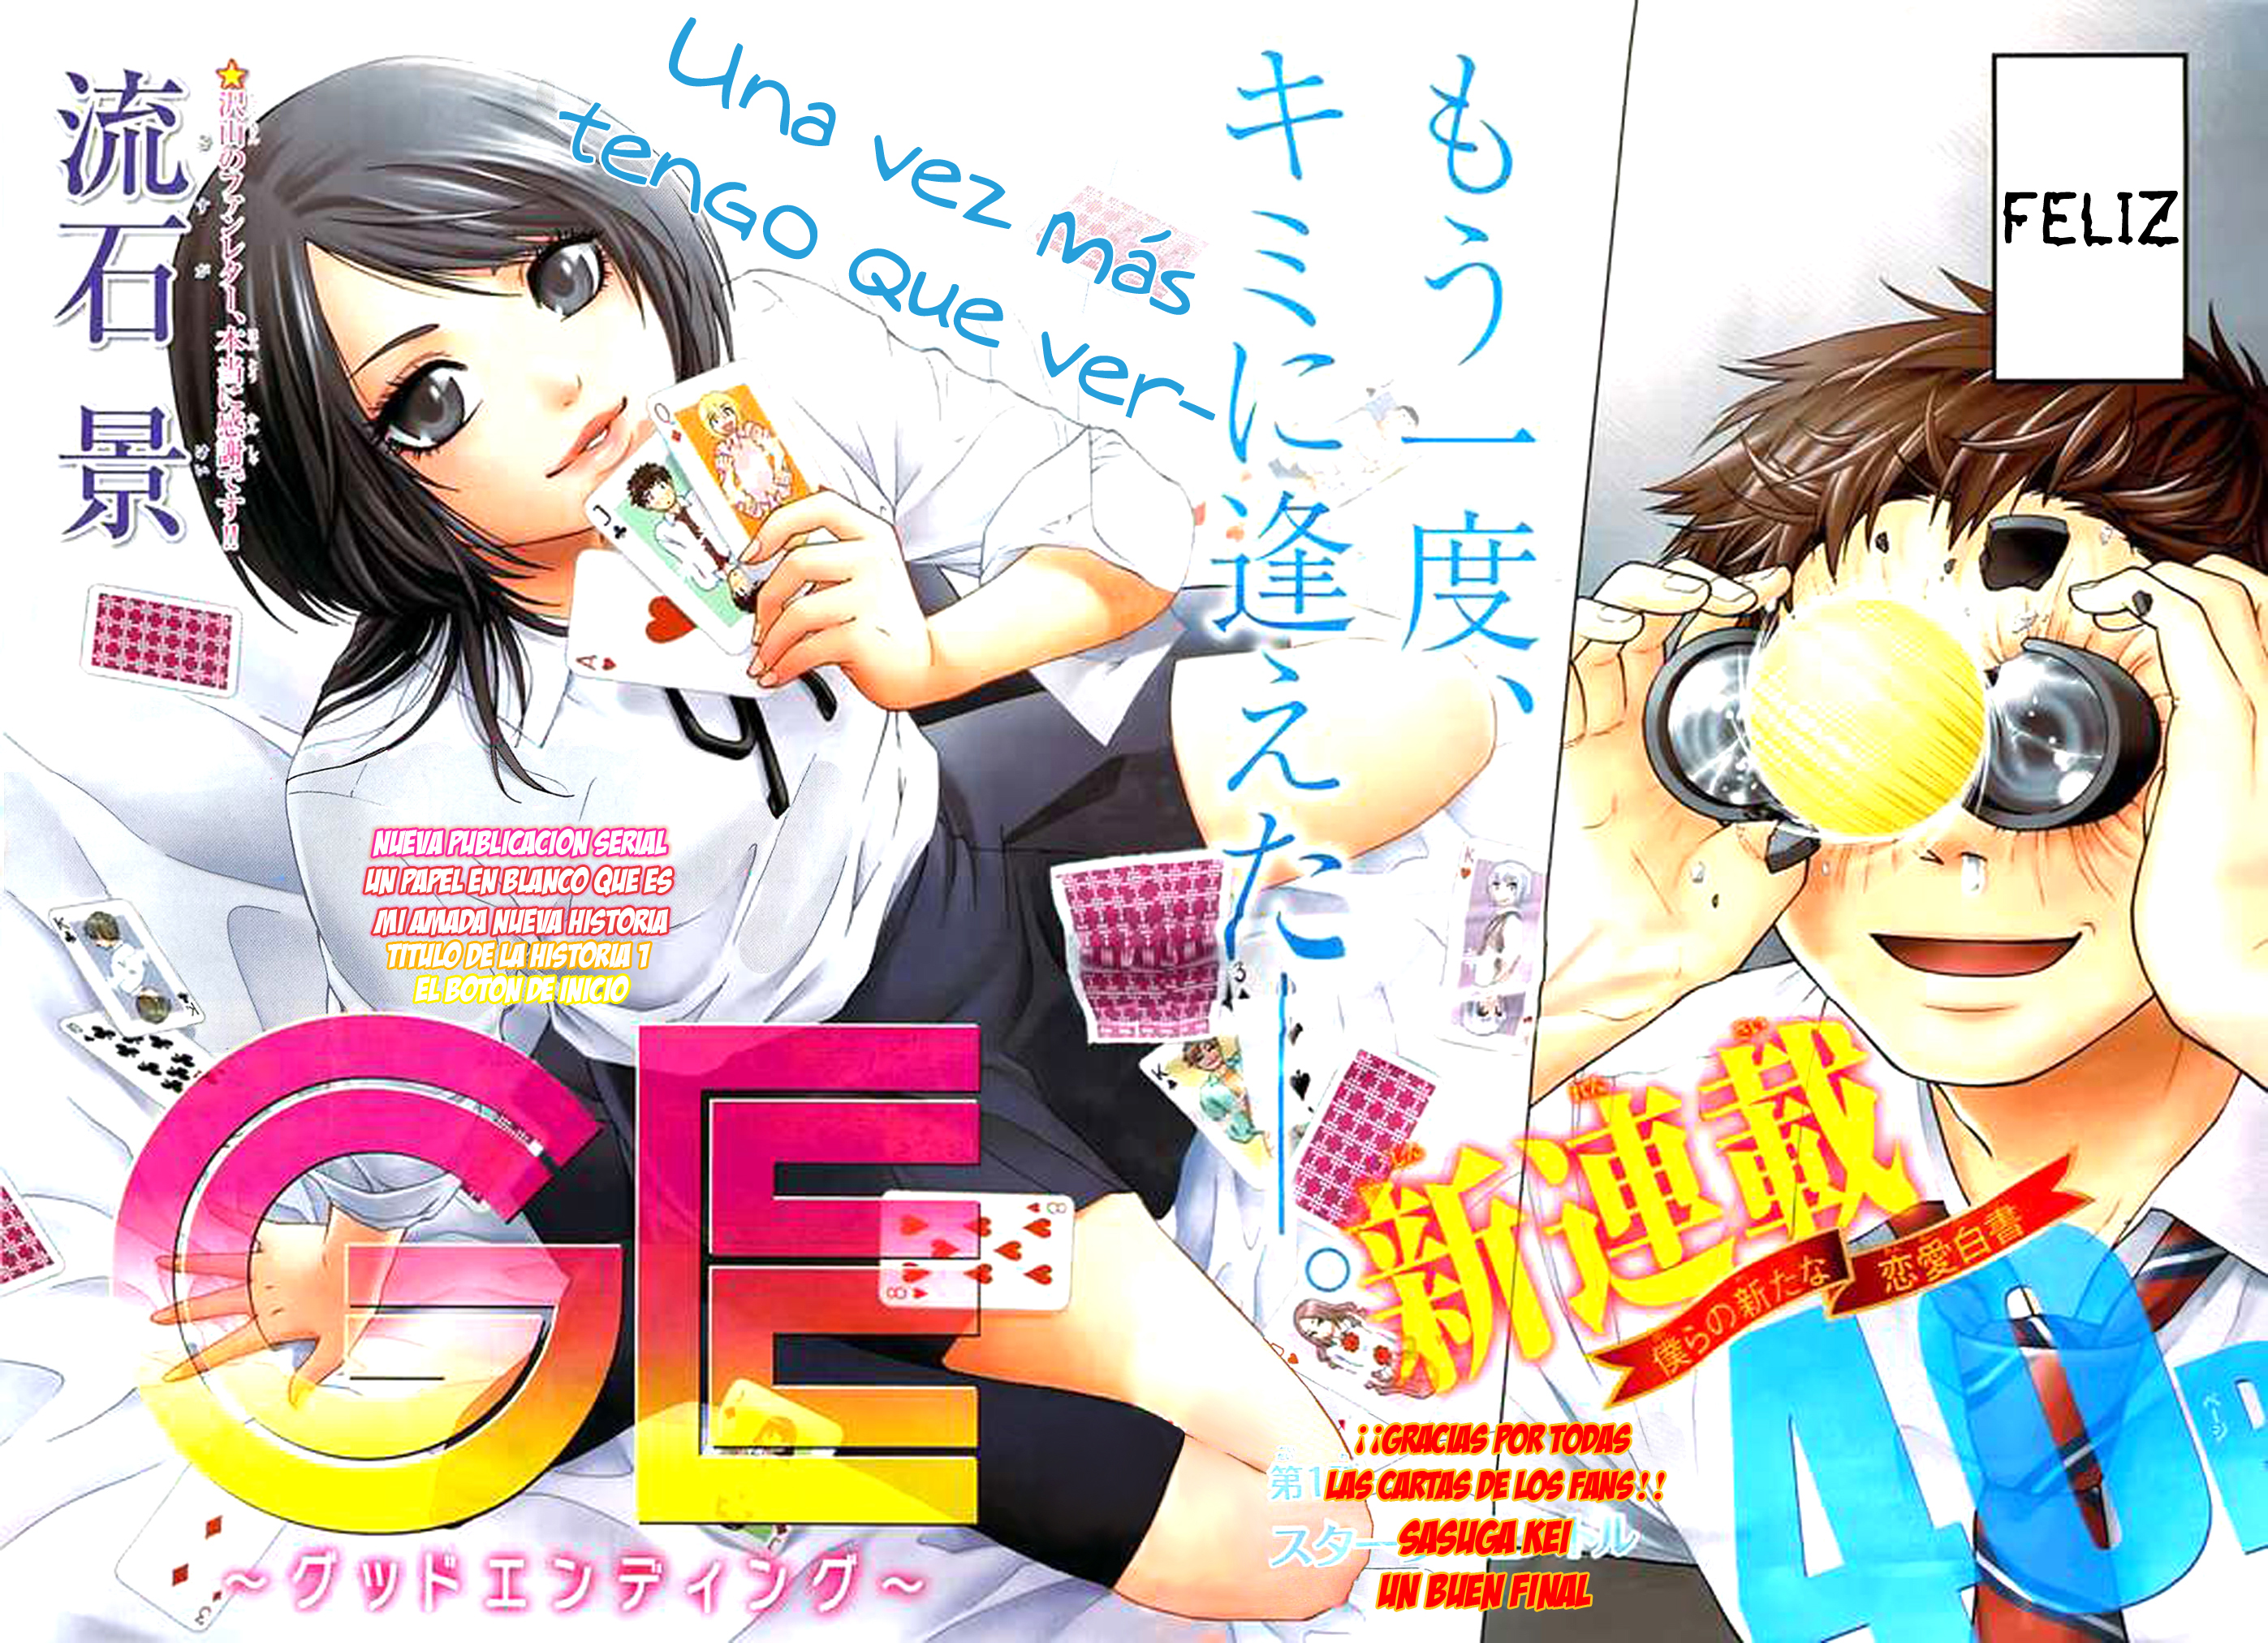 http://c5.ninemanga.com/es_manga/35/419/482049/436daf7e5bdda10a4194fa6e7fb100d9.jpg Page 3